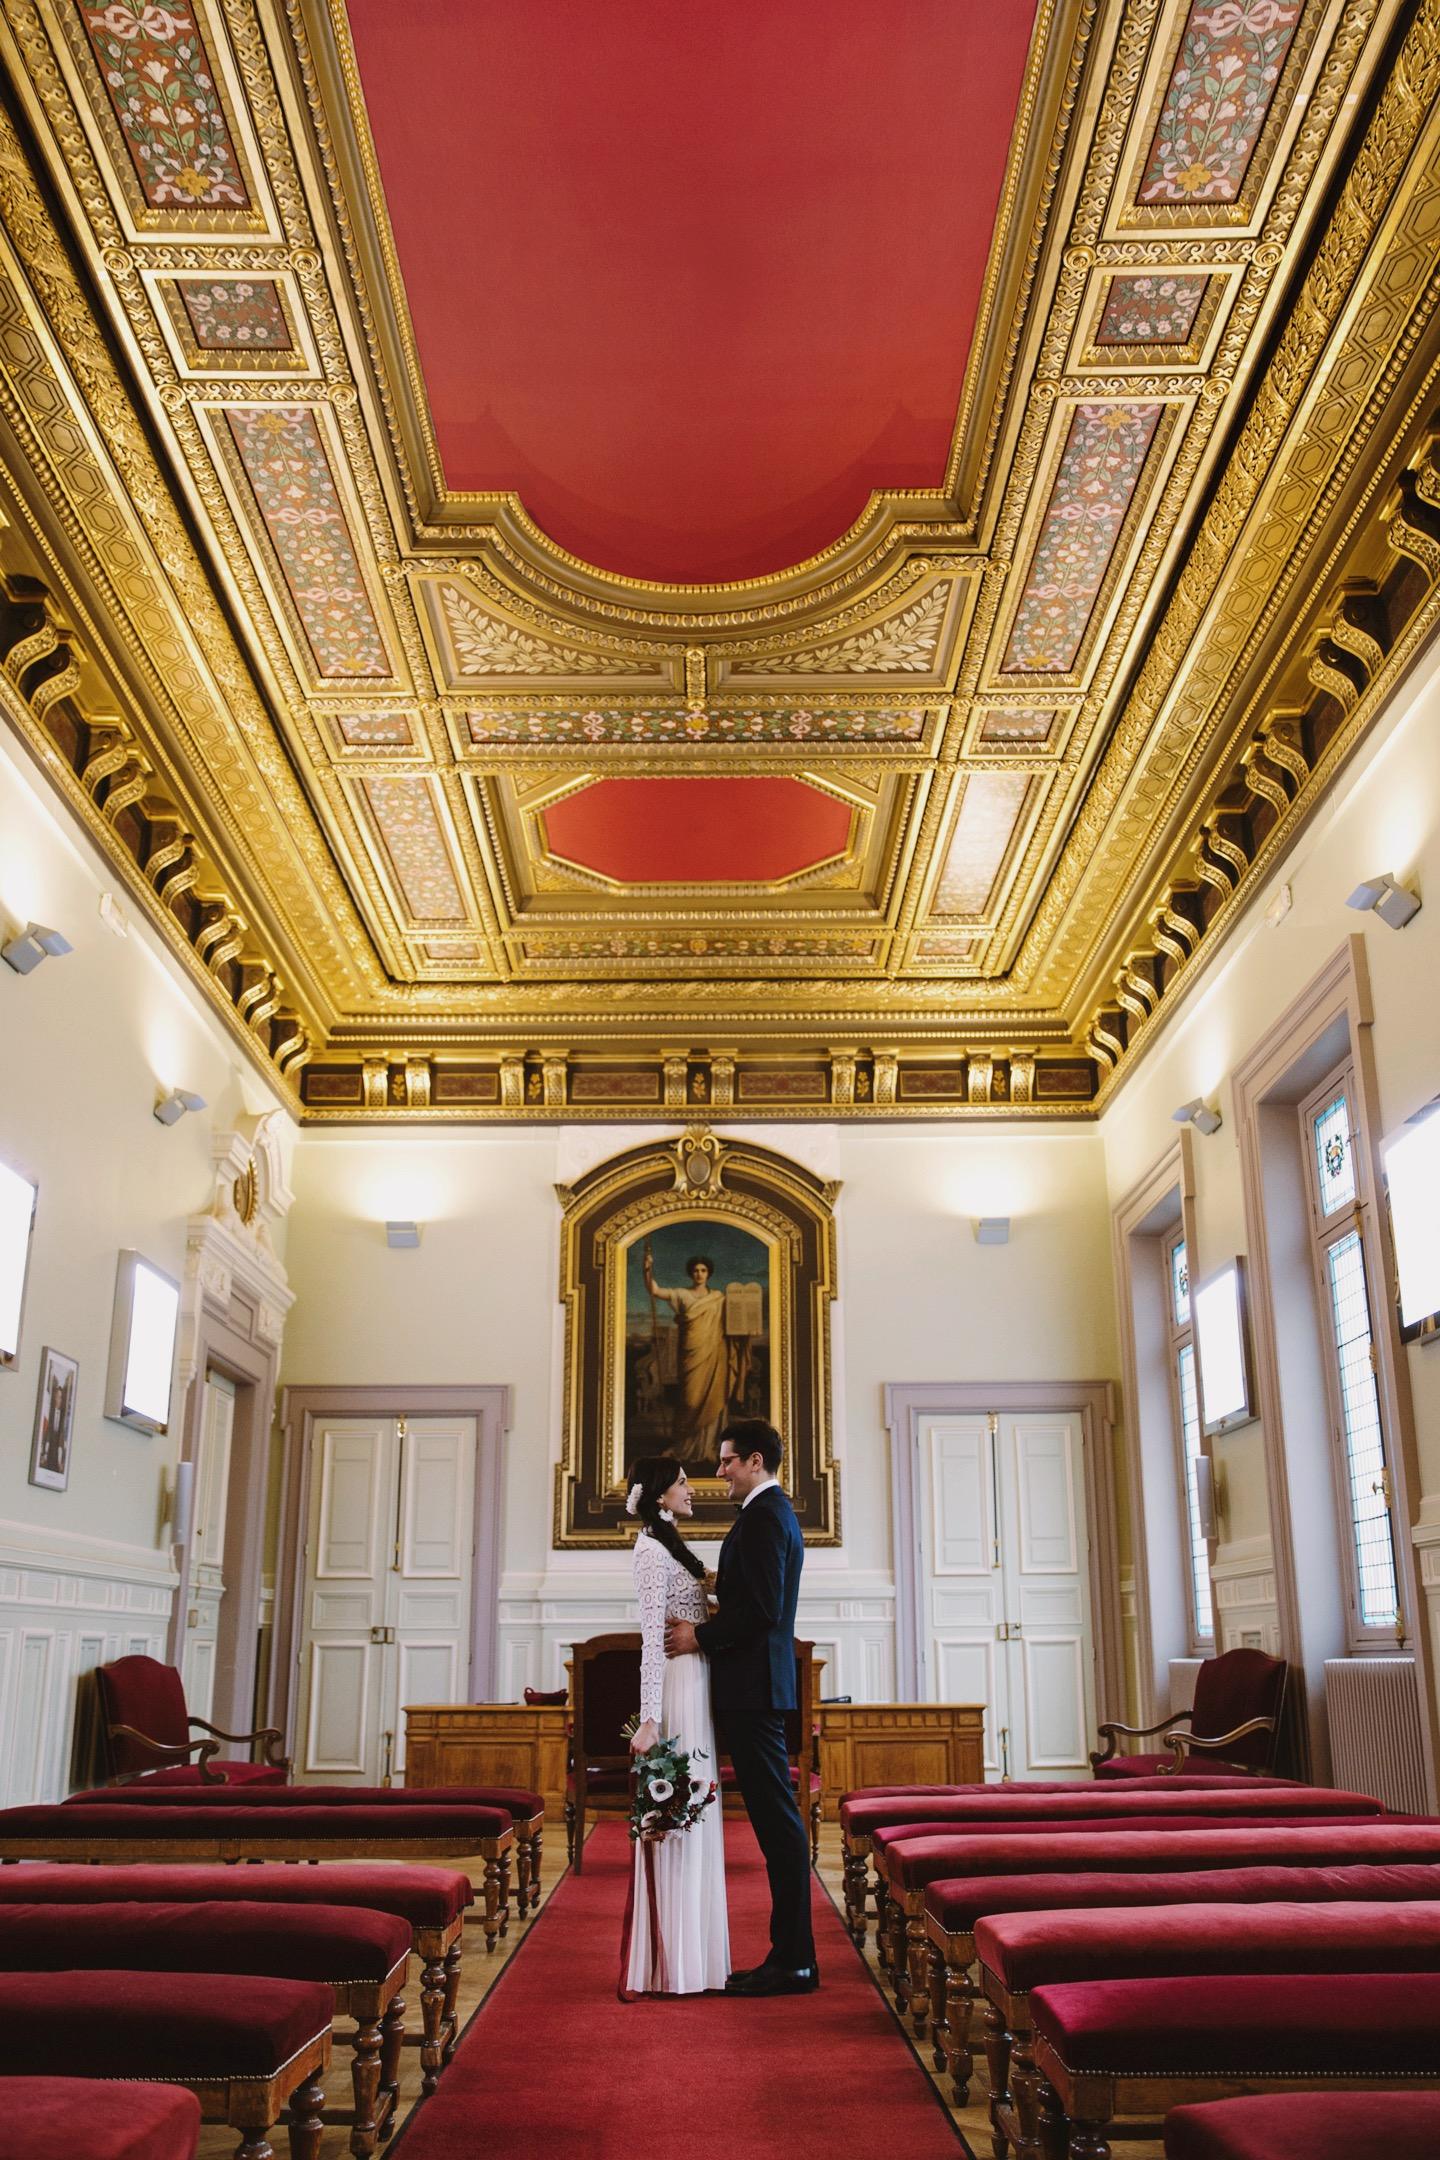 mariage-daphne-moreau-mode-and-the-city-civil-celine-marks65